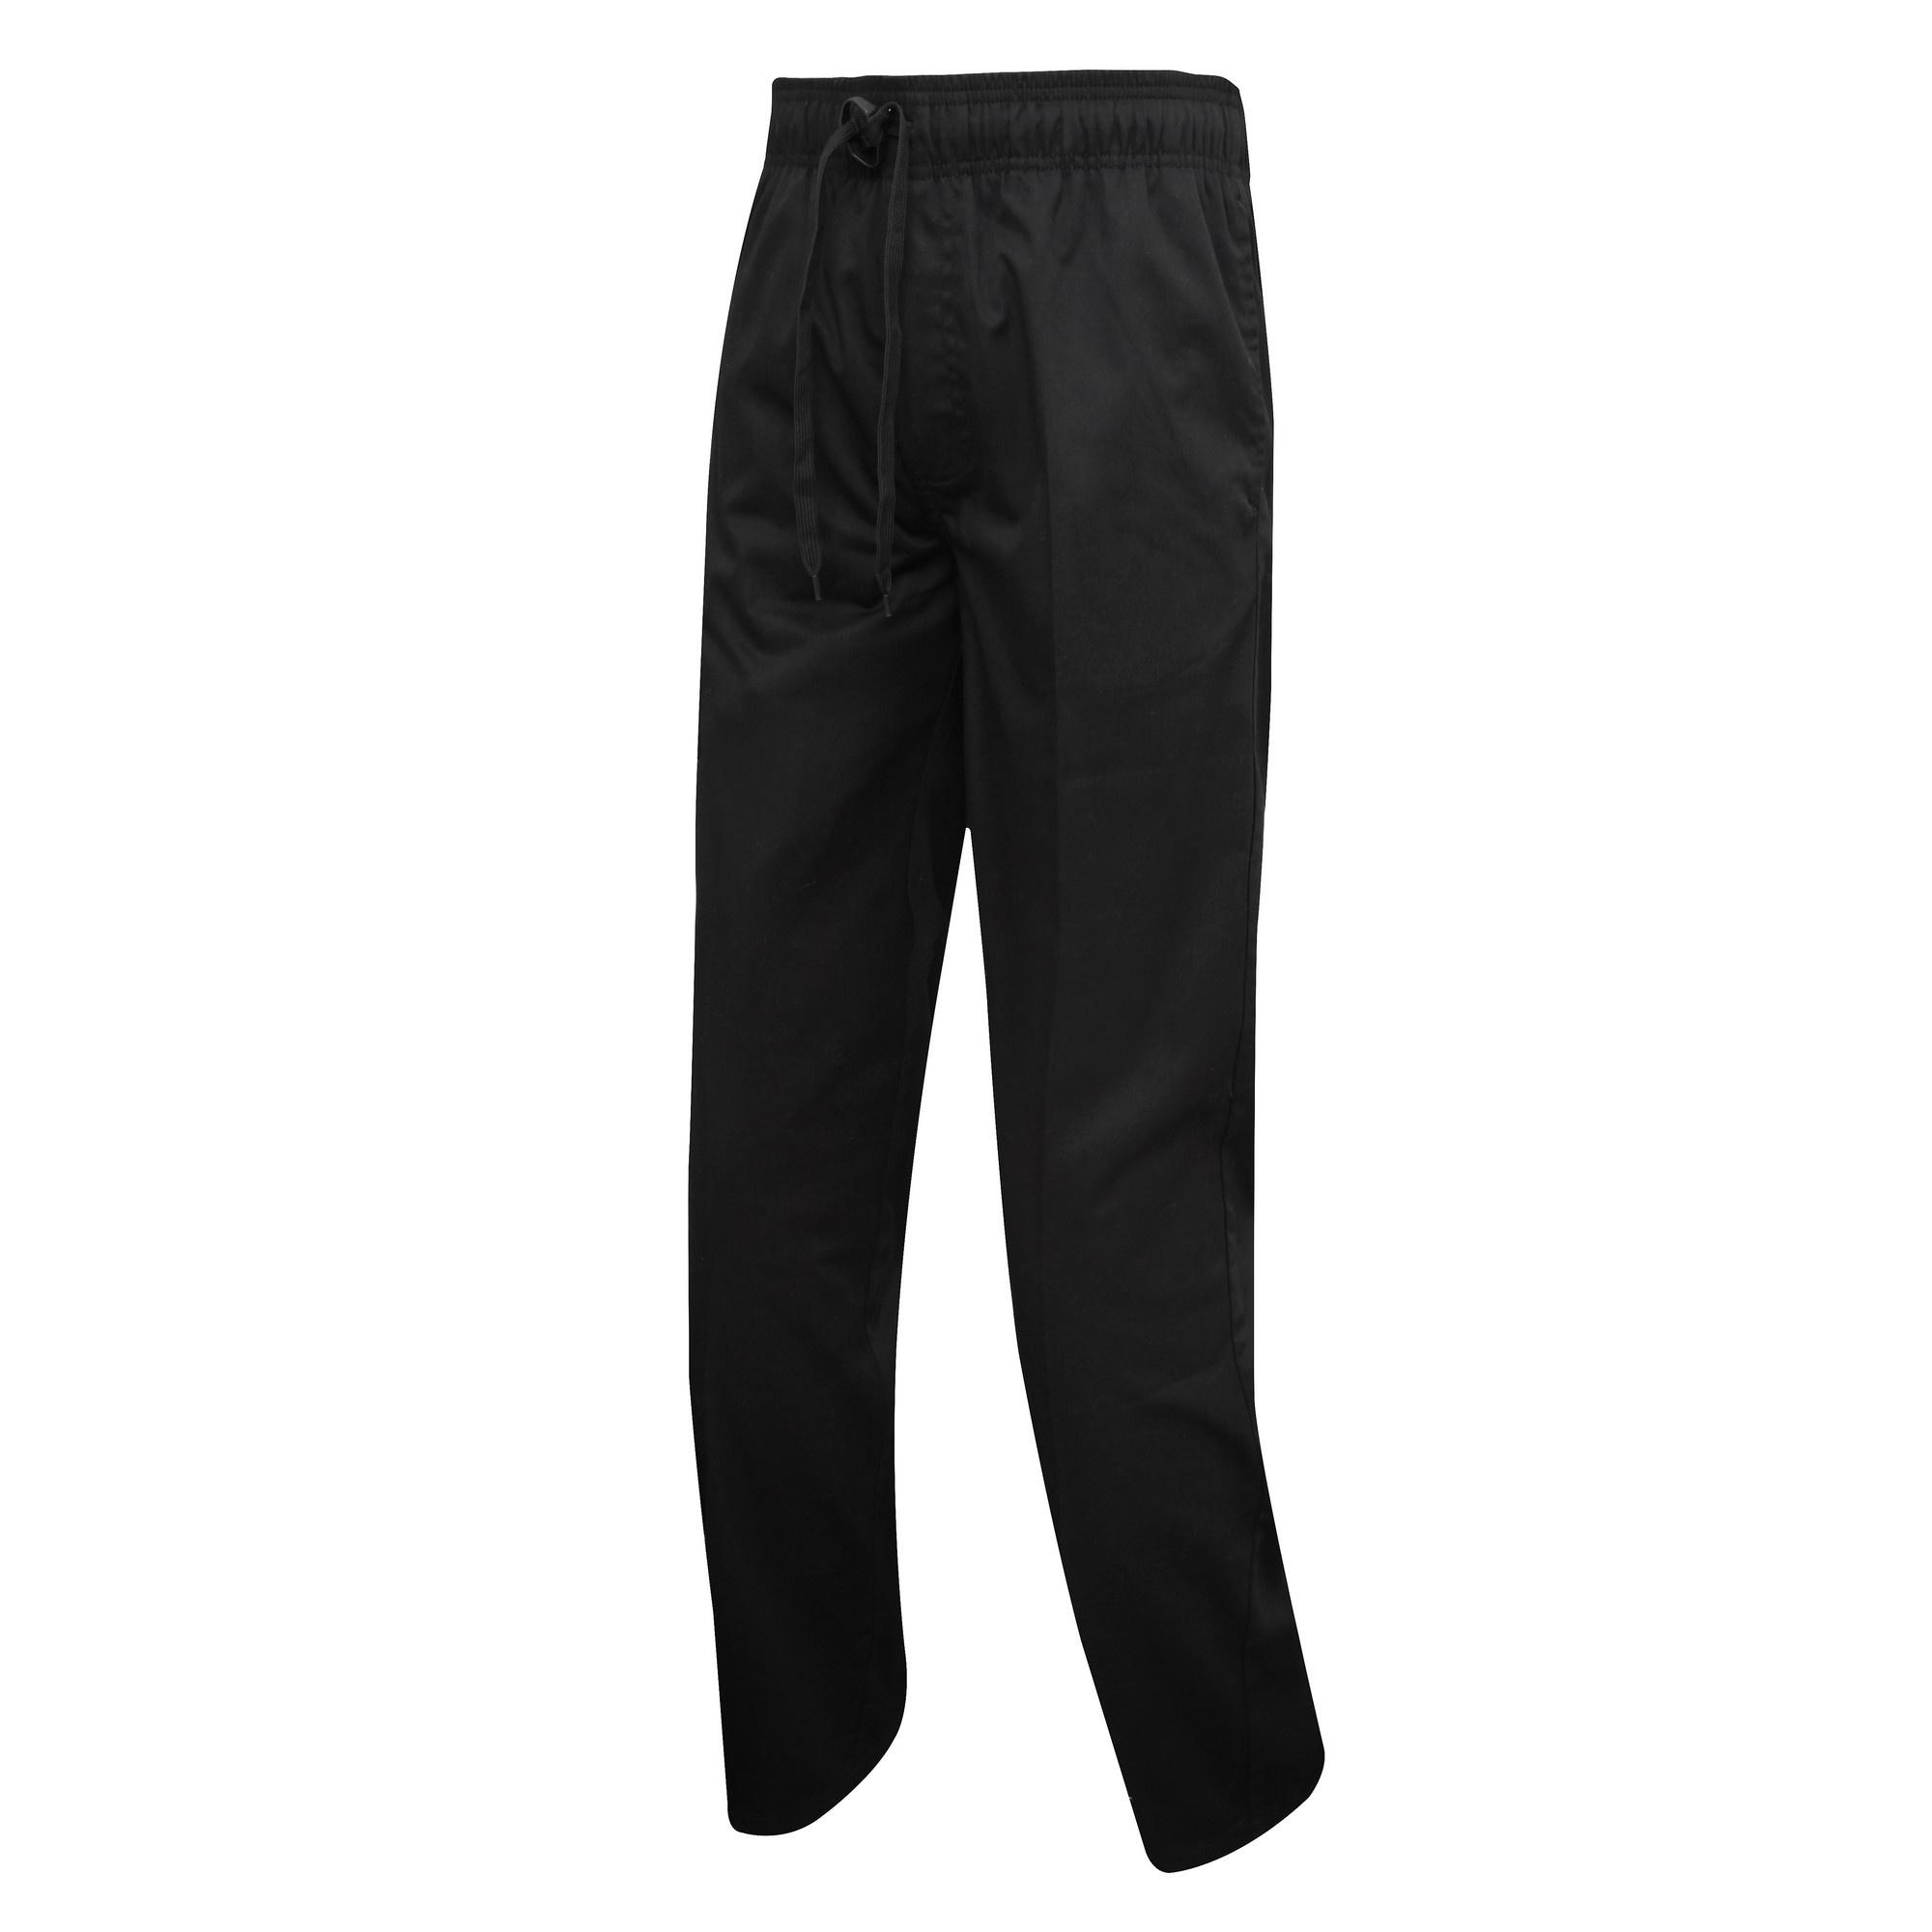 60a05ef473c Premier Mens Chefs Select Slim Leg Trousers Utrw5521 6 XS Black